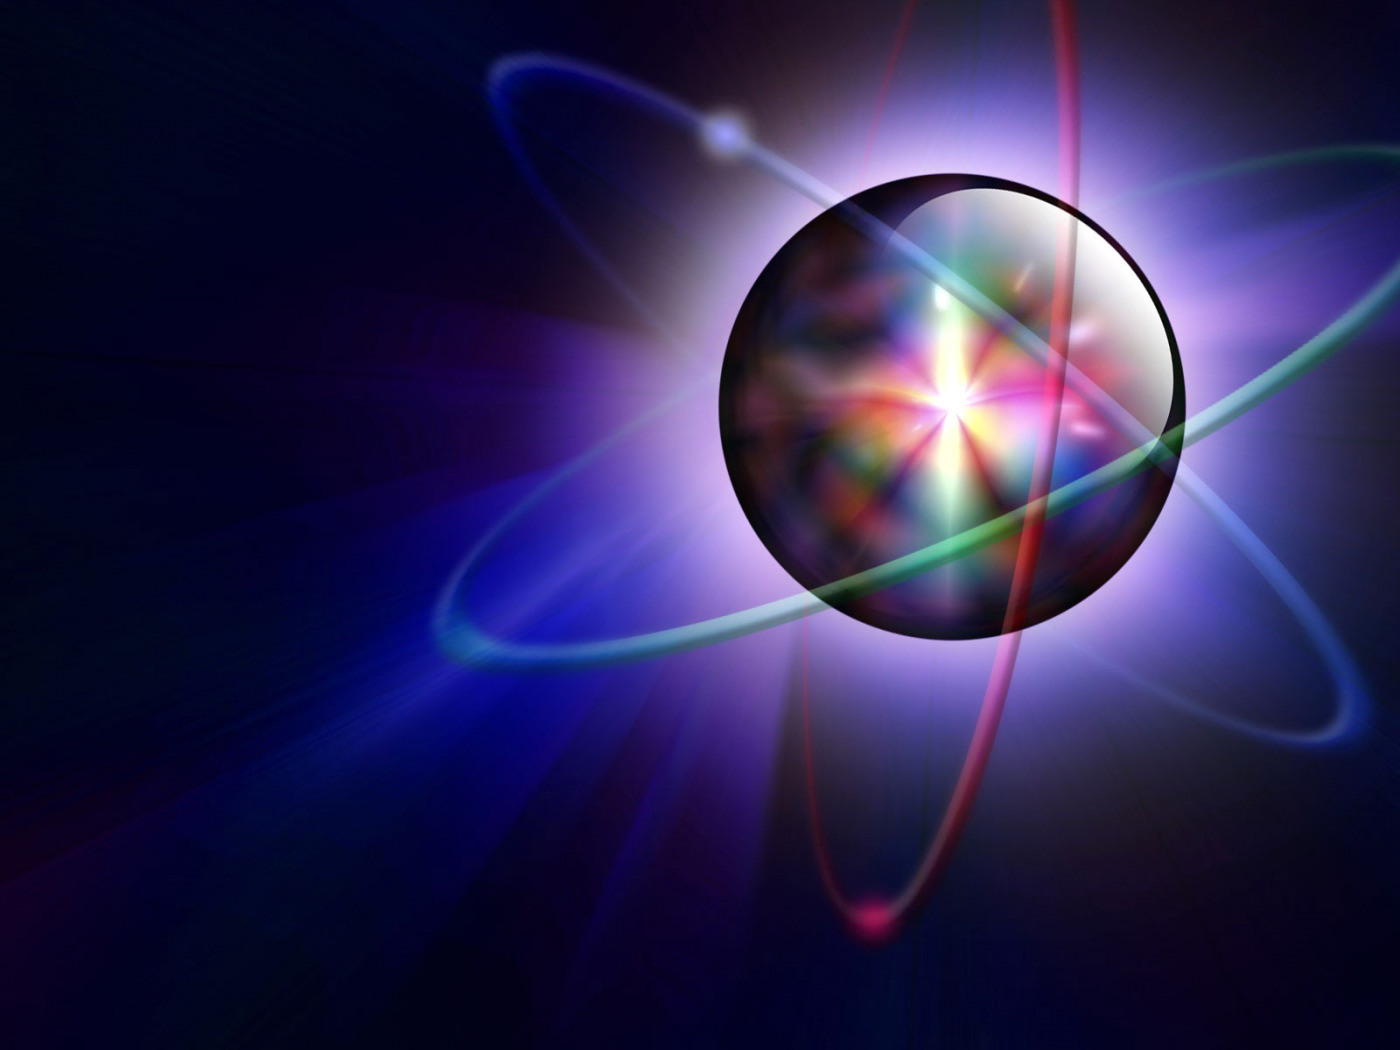 орбита электрона картинки открытки, которые могут